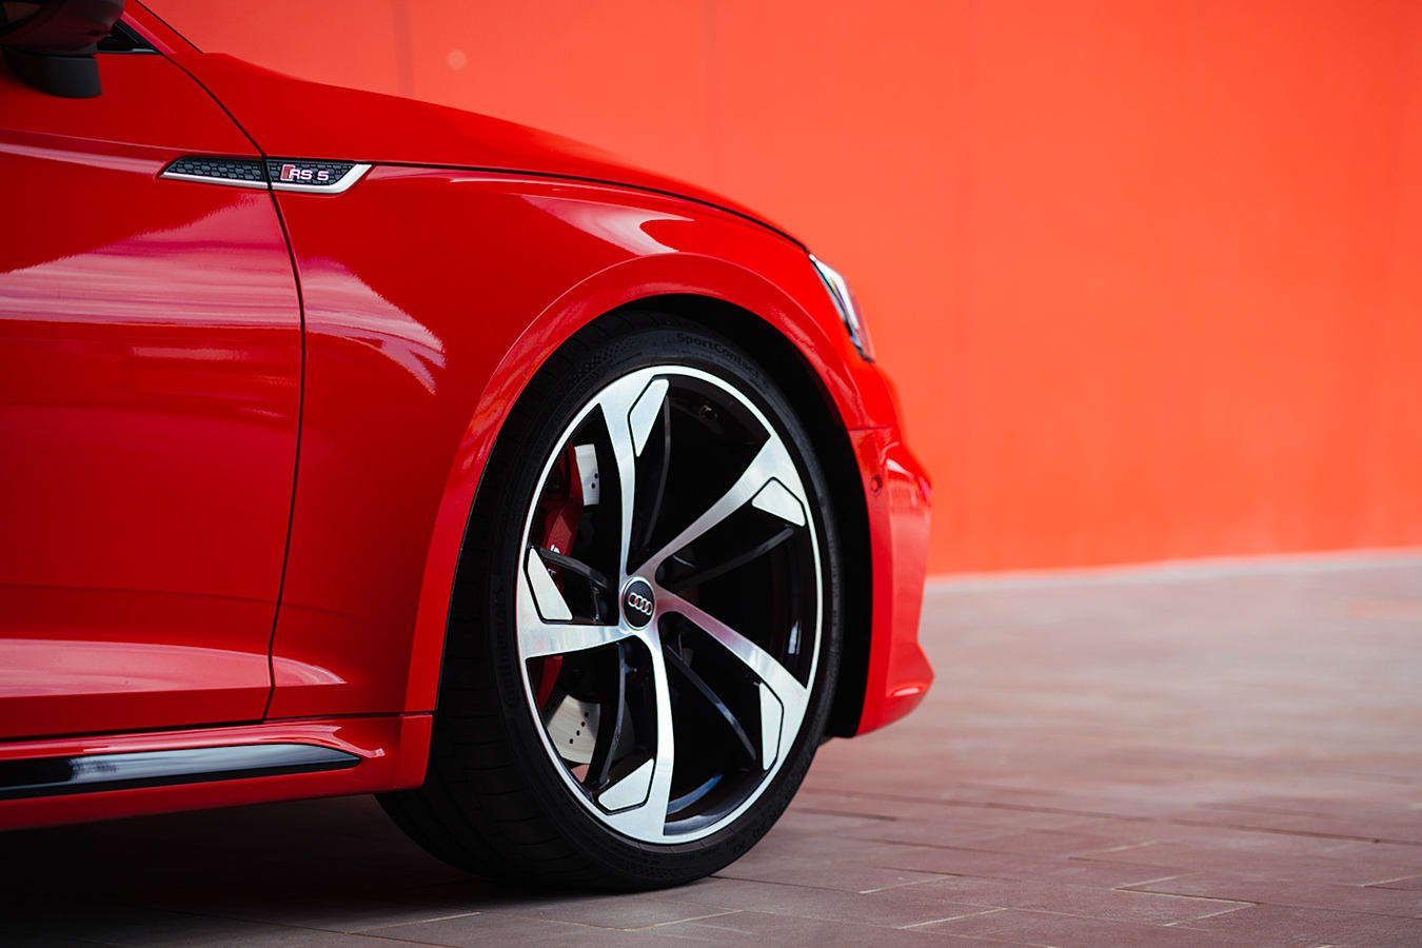 Audi Rs 5 Wheels Jpg